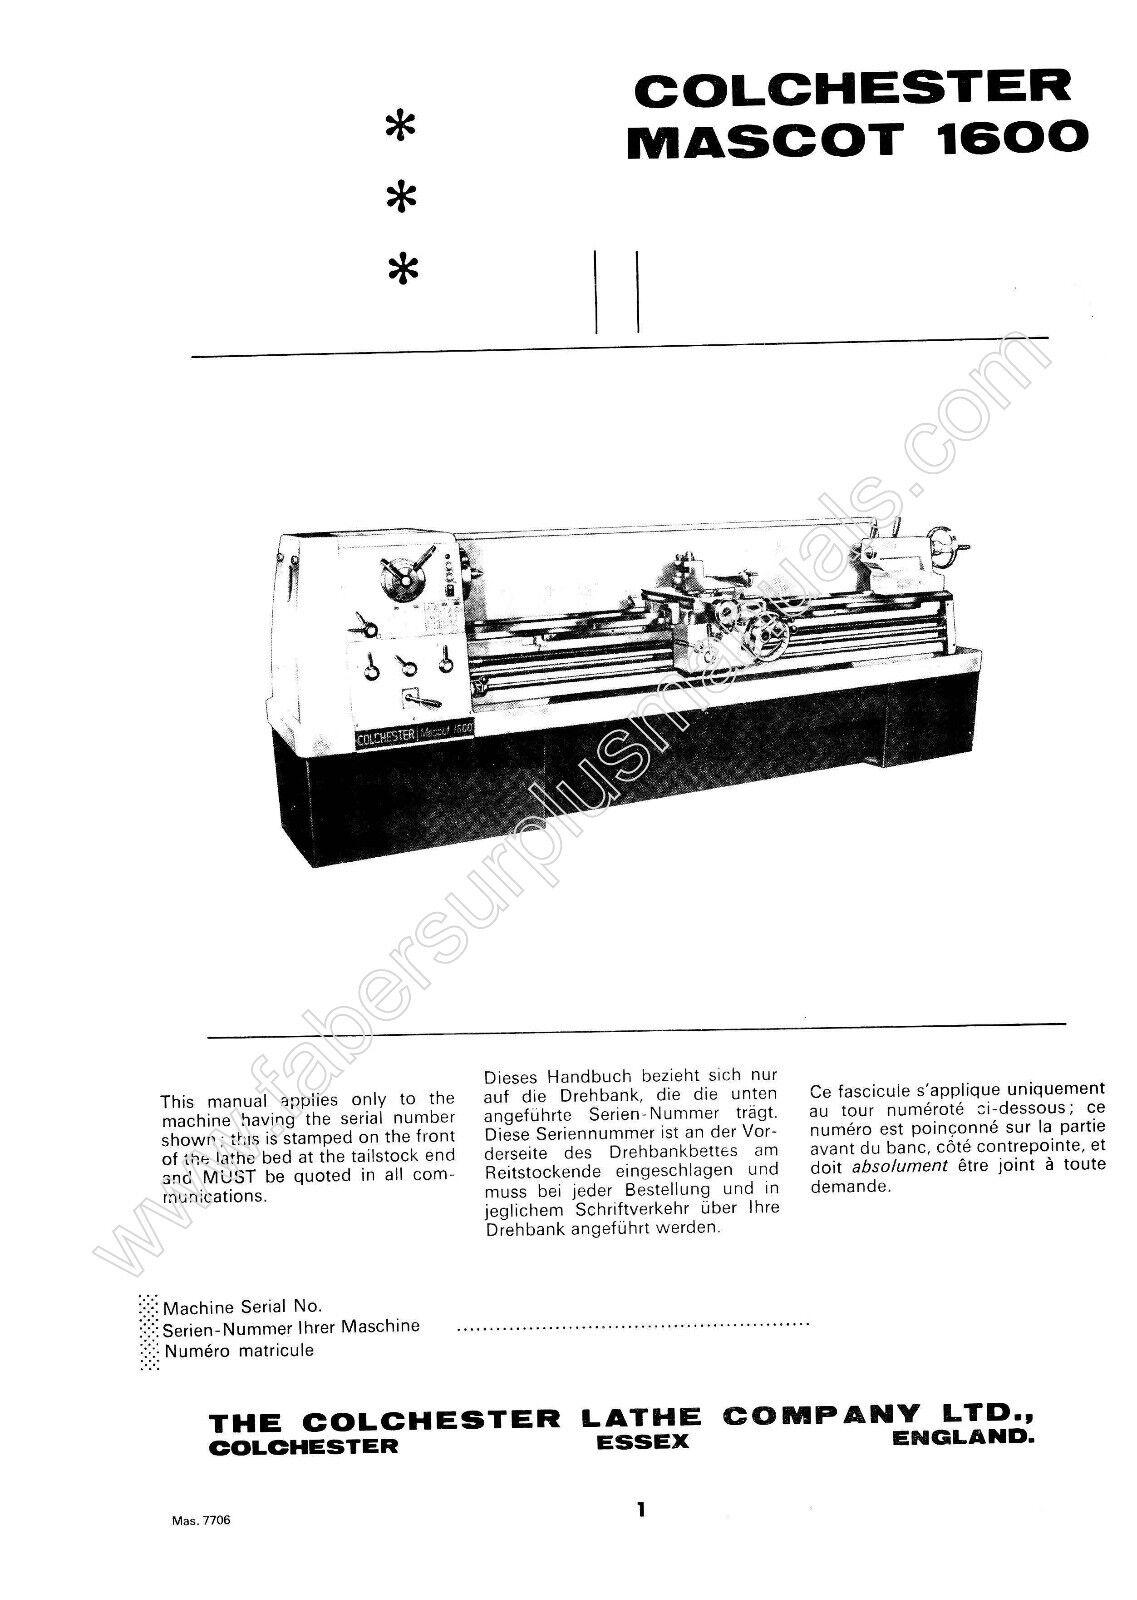 John Deere UP06764 SHIPS FREE Homelite 308042003 A 97910 A Trimmer Bumb Knob